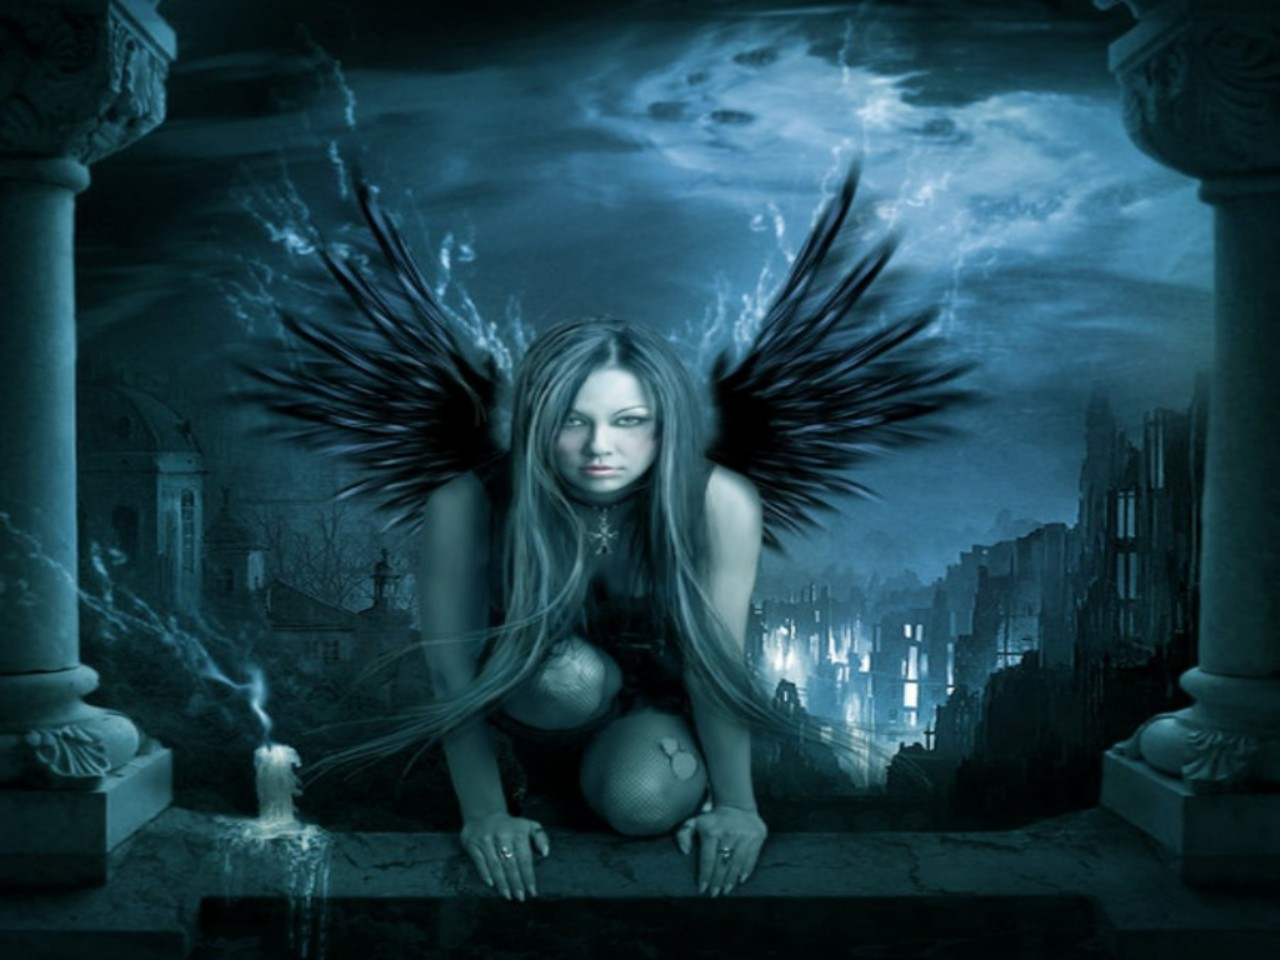 Gothic Angel Wallpaper Background 27342 1280x960